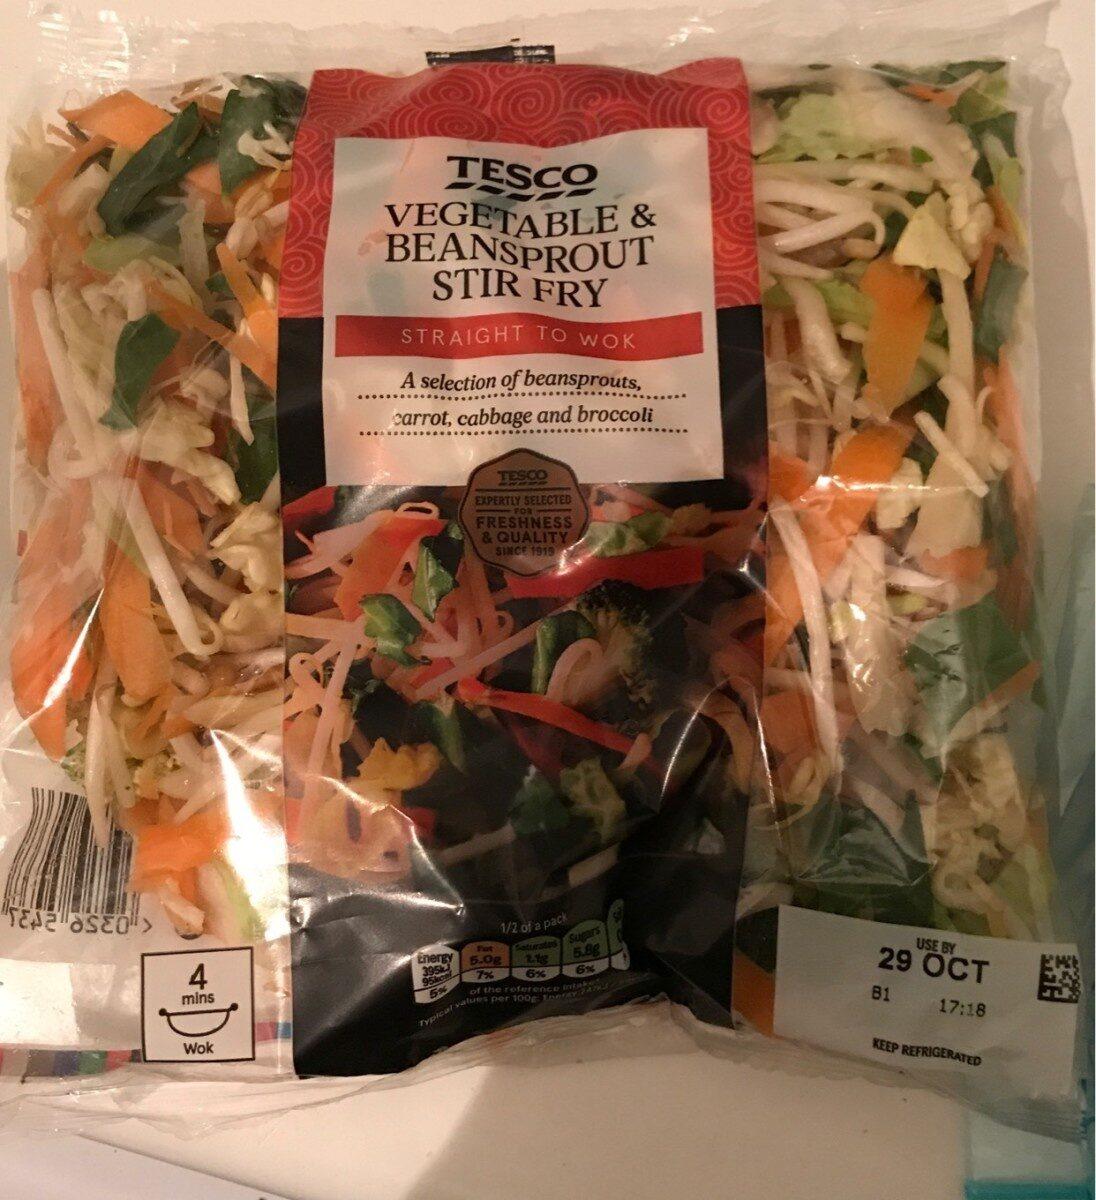 Vegetable & Beansprout Stir Fry - Product - en